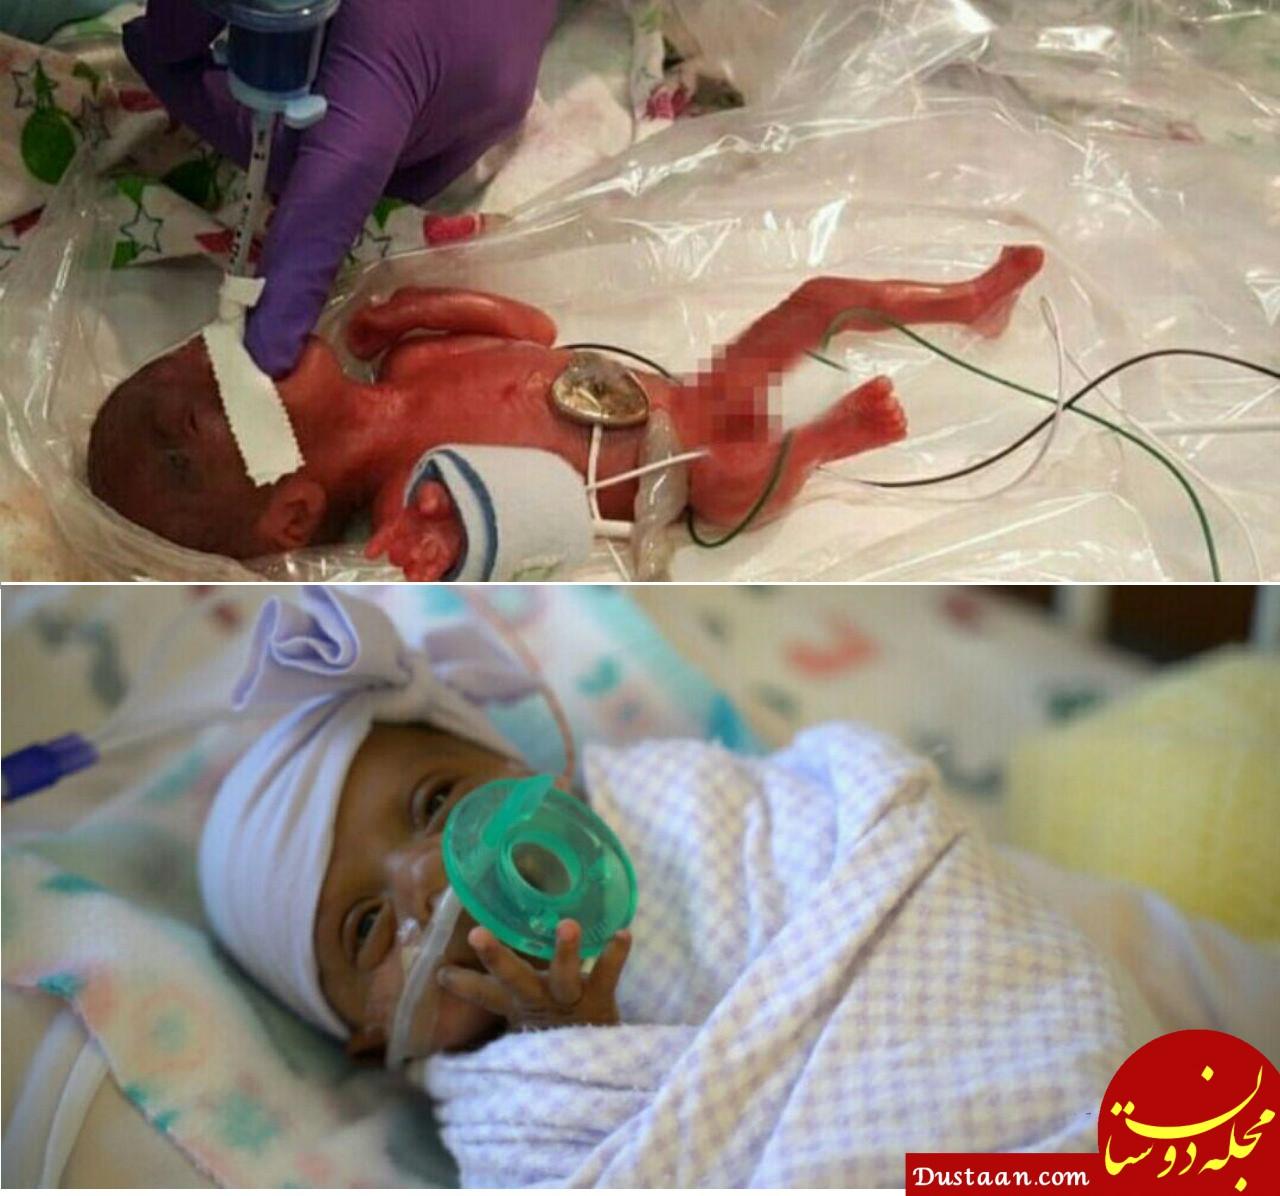 www.dustaan.com کوچک ترین نوزاد متولد شده جهان! +عکس